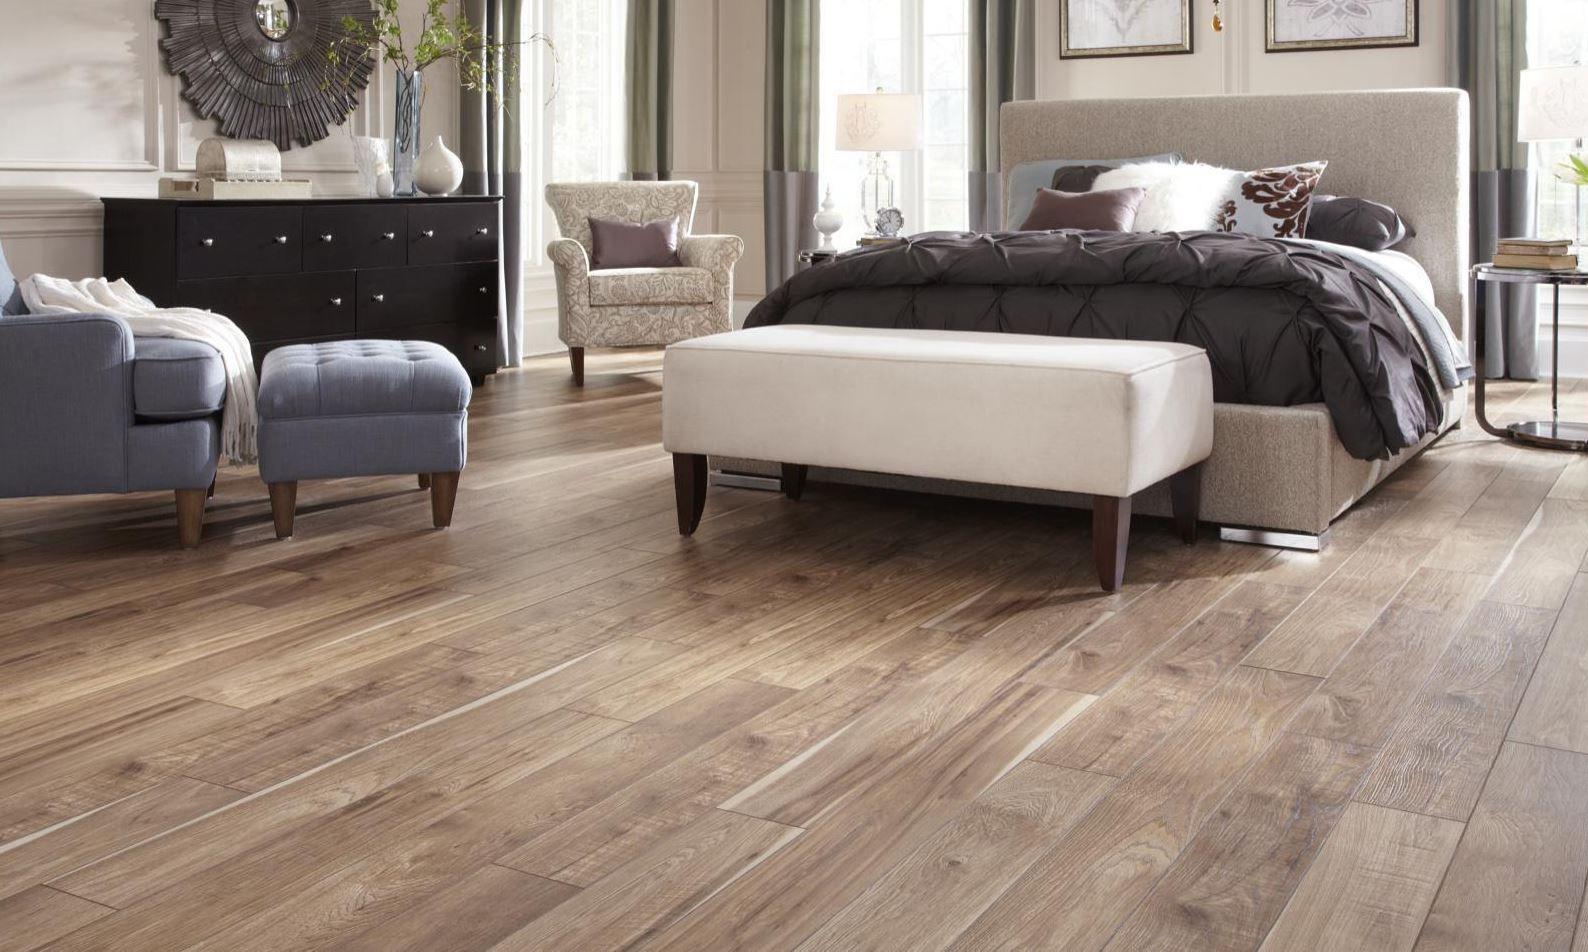 Luxury vinyl plank flooring that looks like wood luxury vinyl luxury vinyl plank flooring that looks like wood dailygadgetfo Gallery